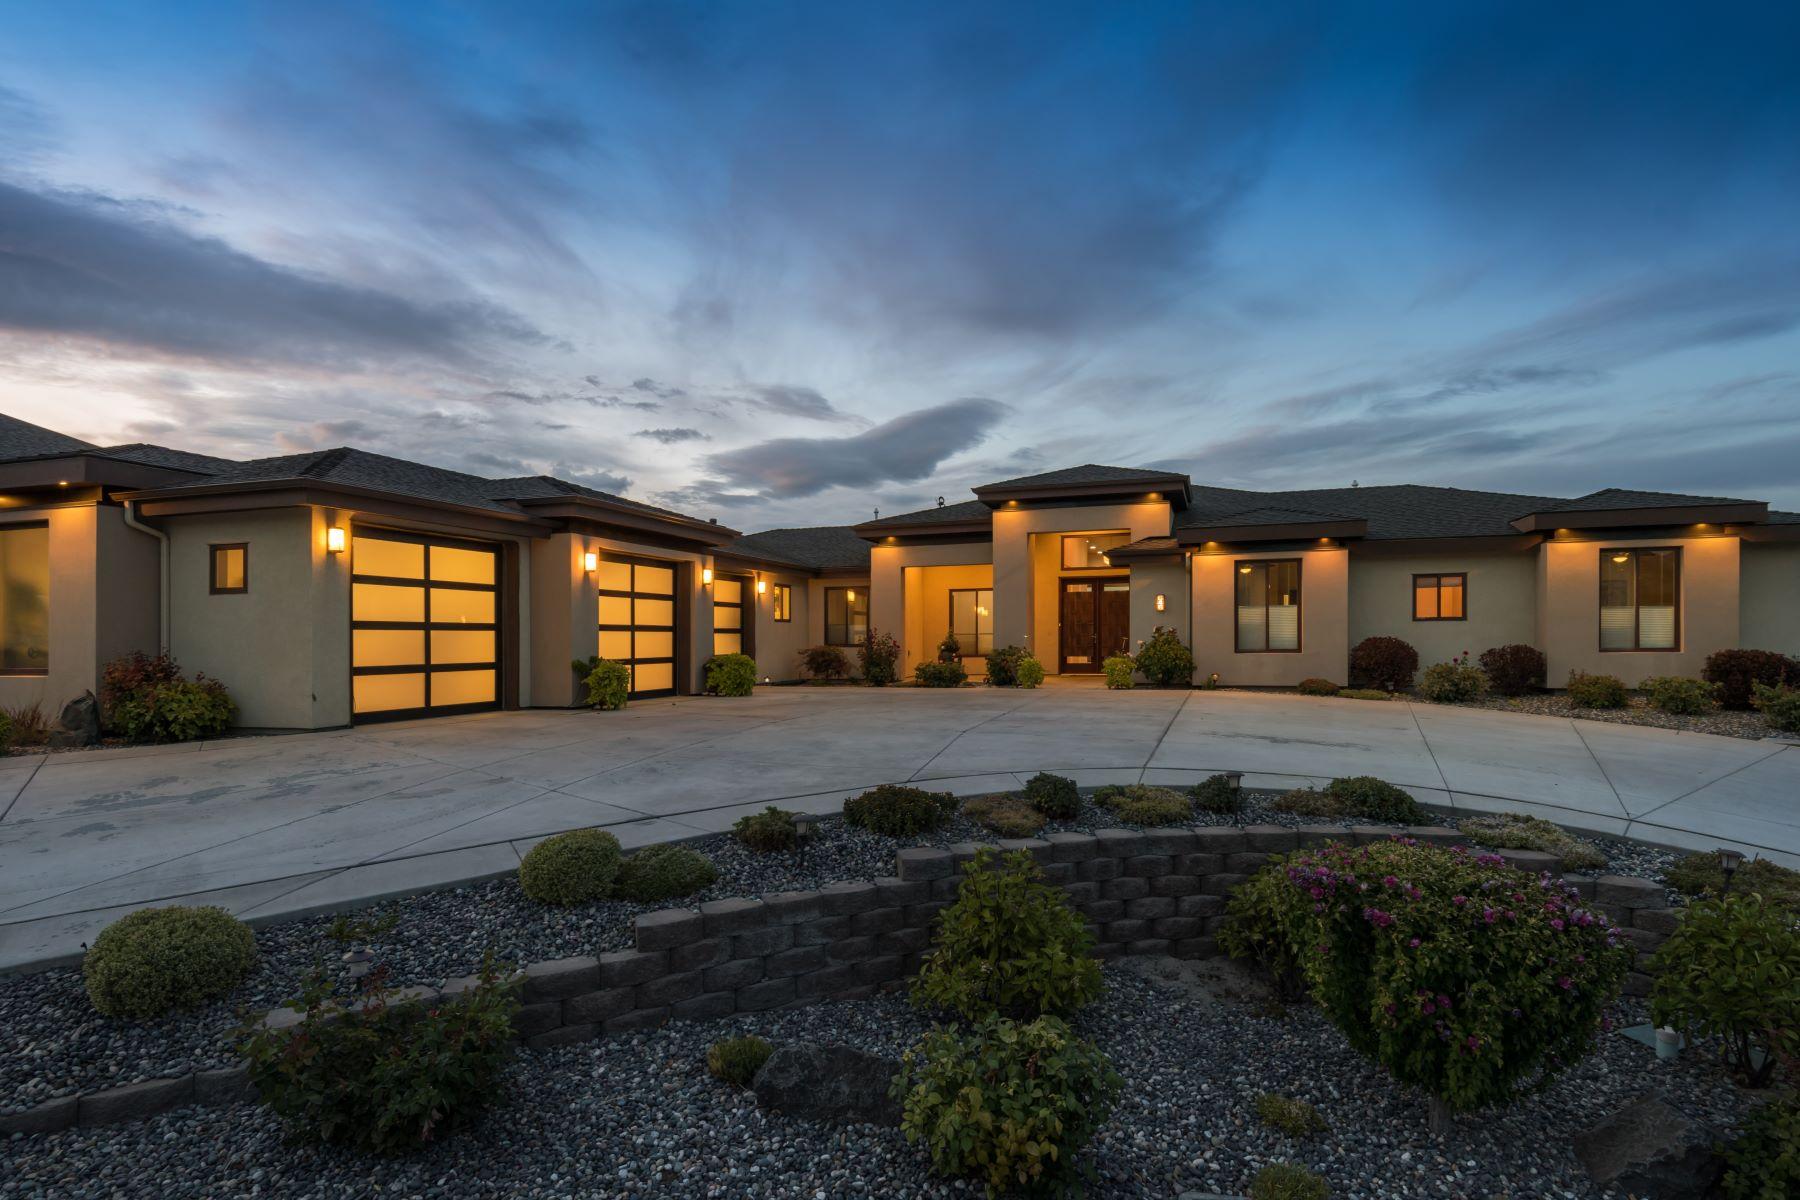 Single Family Homes for Sale at Elegant, Contemporary, Custom-Built Estate 646 Summit Street Richland, Washington 99352 United States